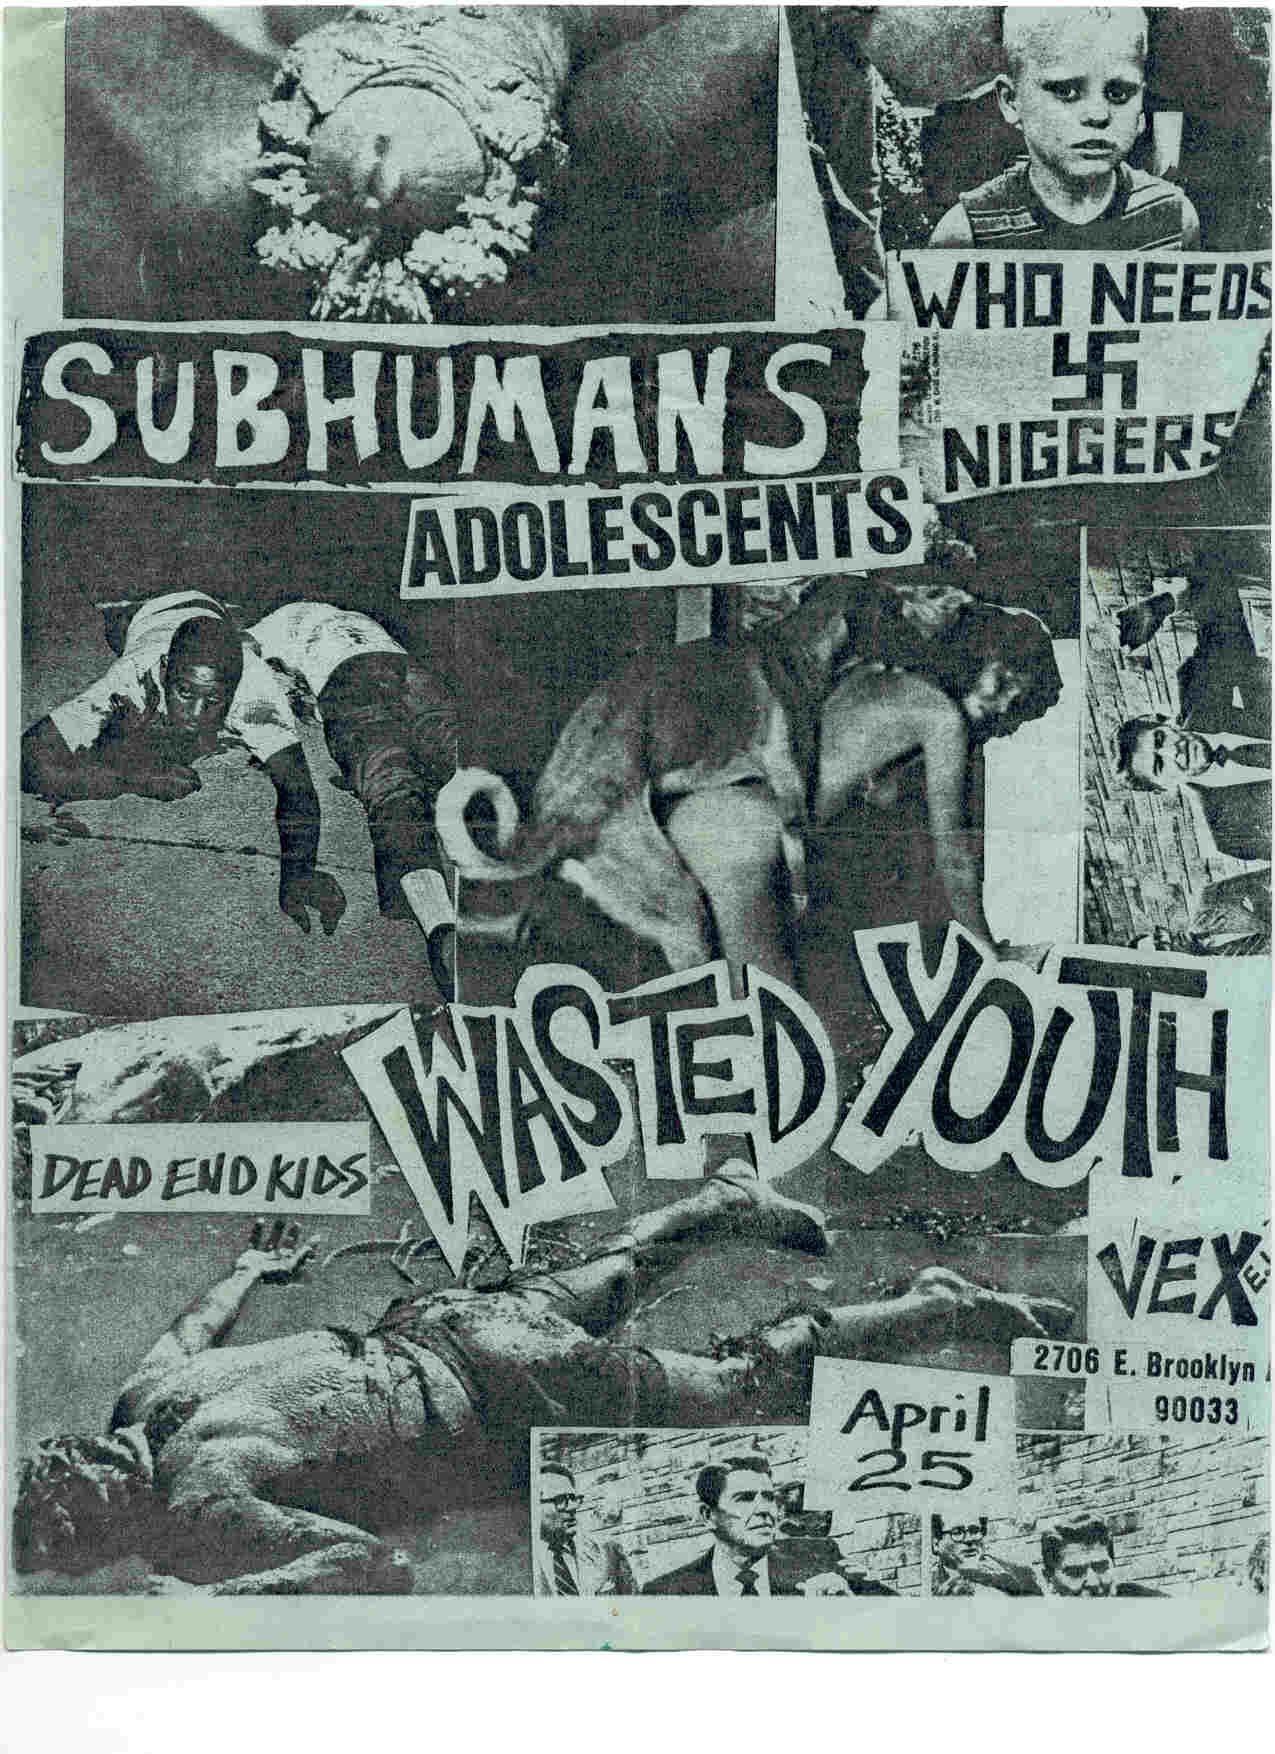 Subhumans/Wasted Youth